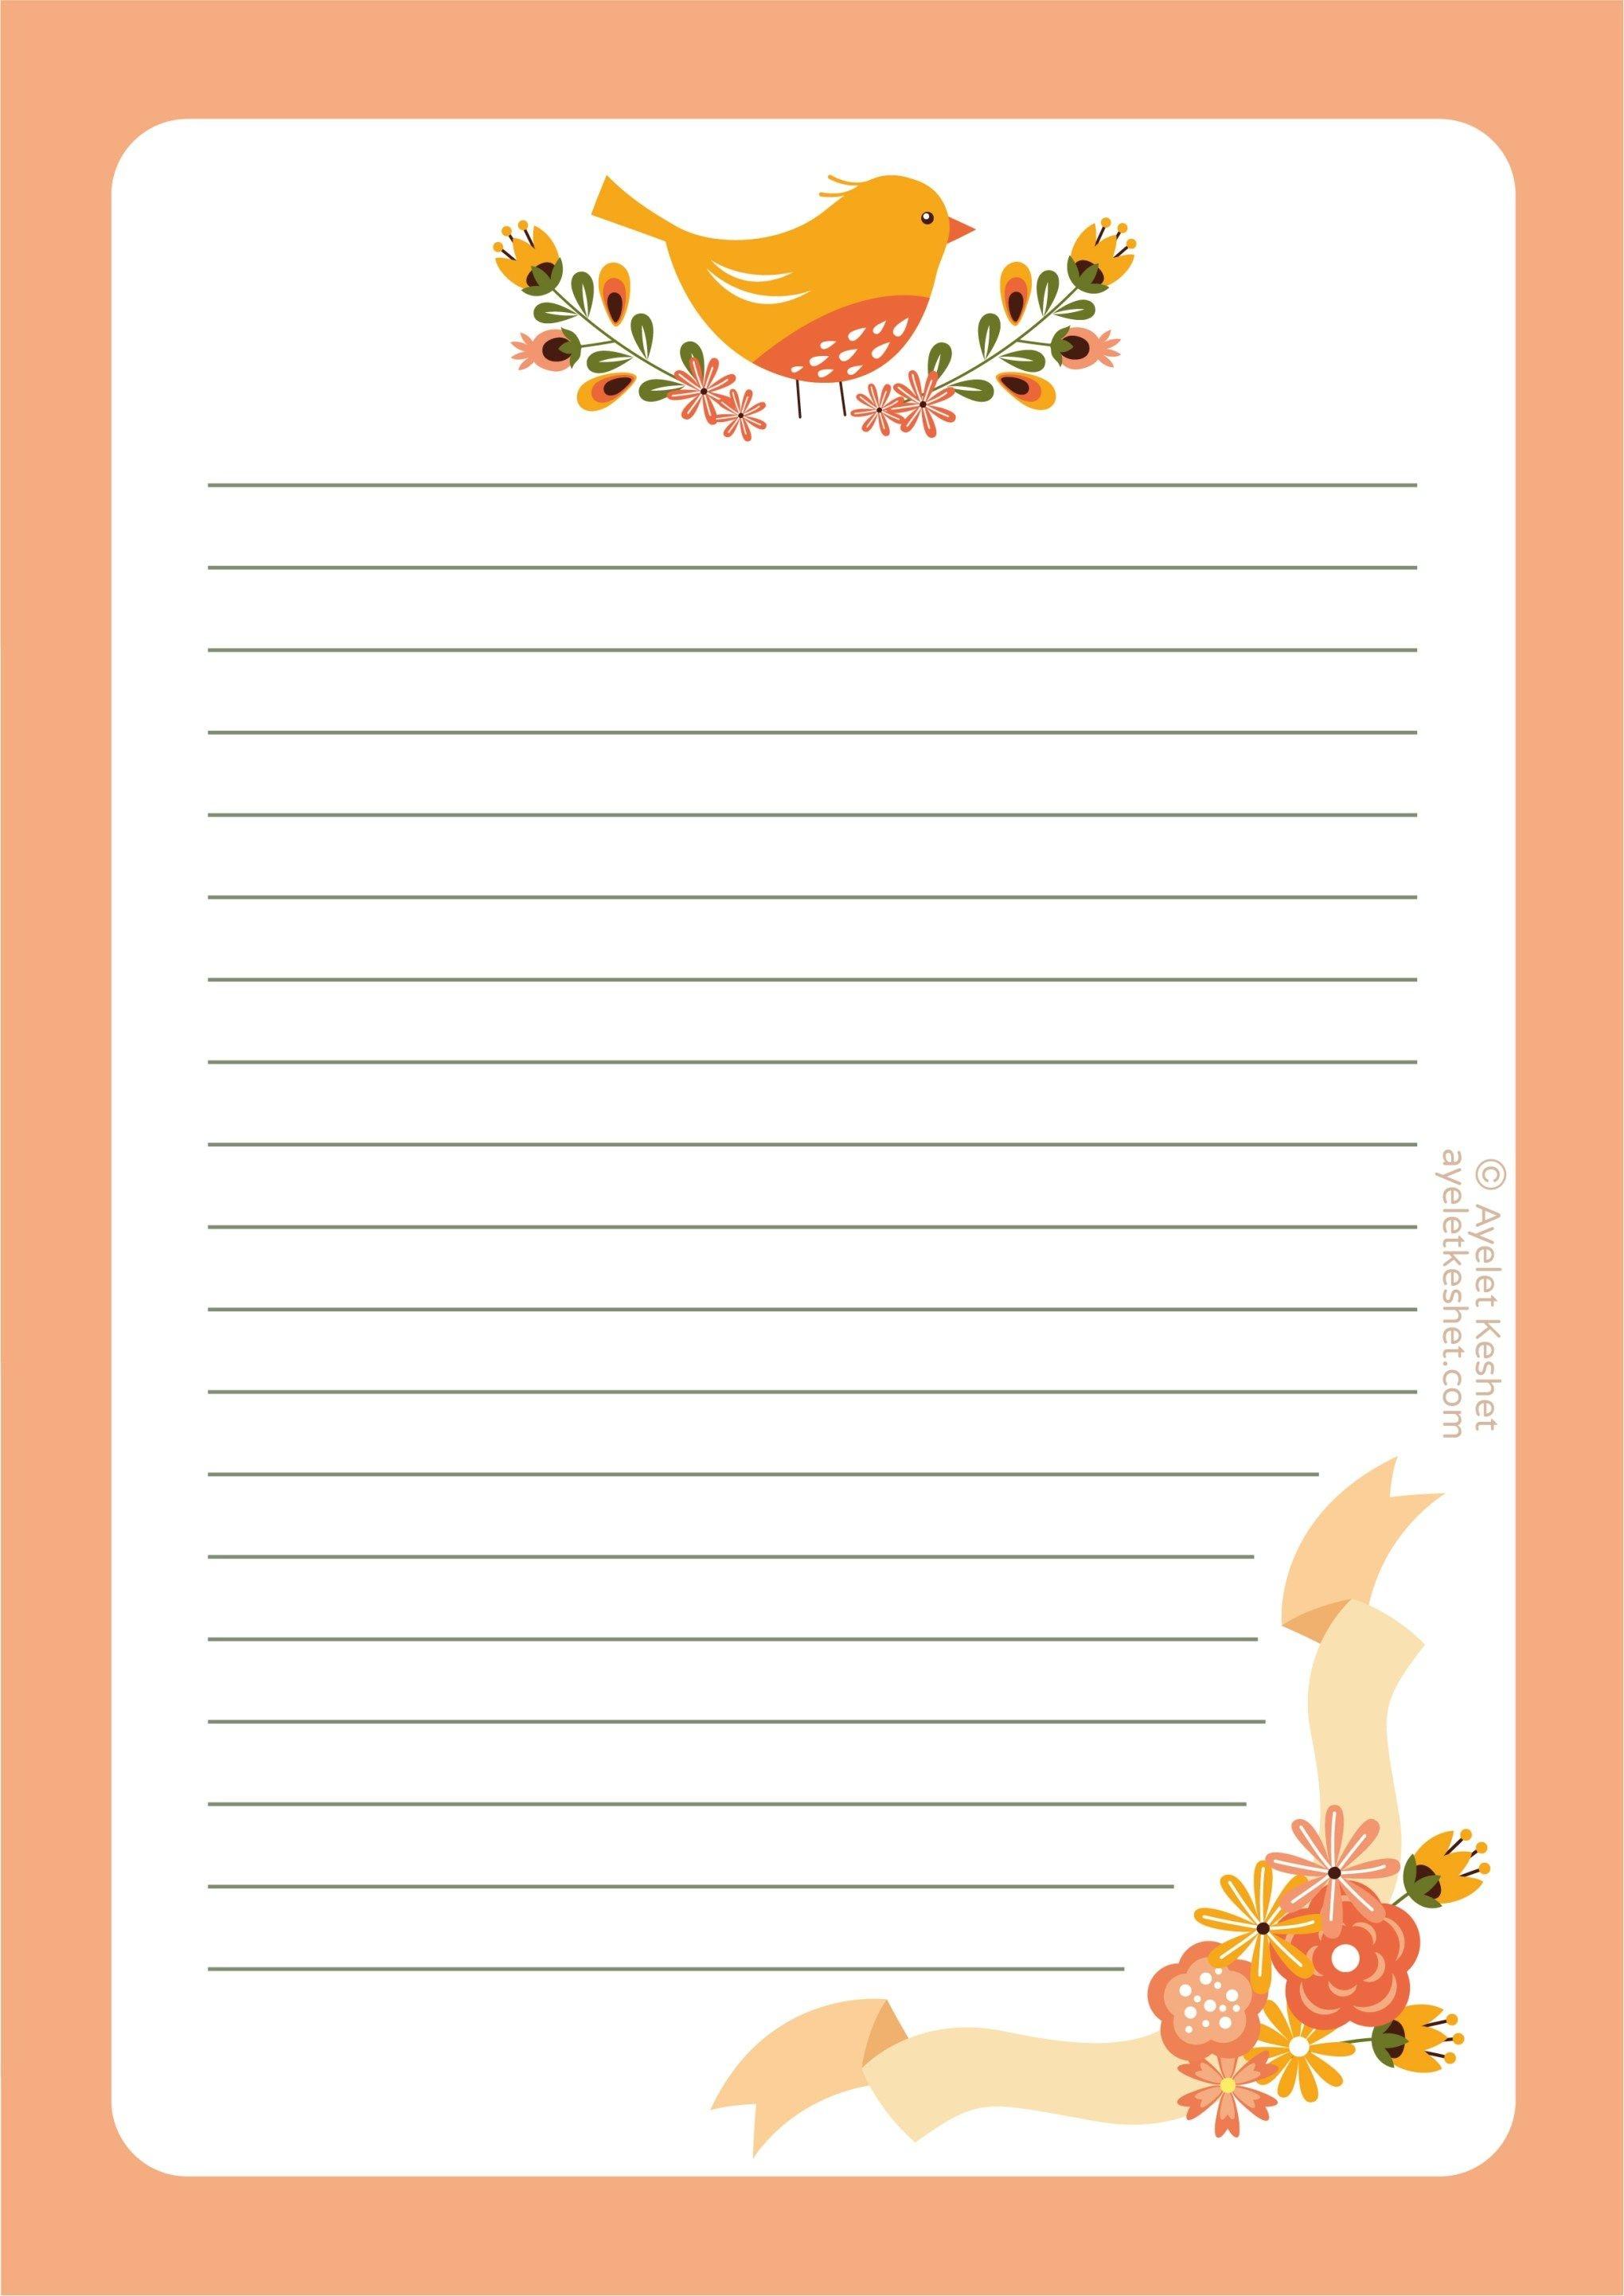 Free Printable Letter Paper | Journals, Notebks, Plnrs | Paper - Free Printable Stationery Writing Paper